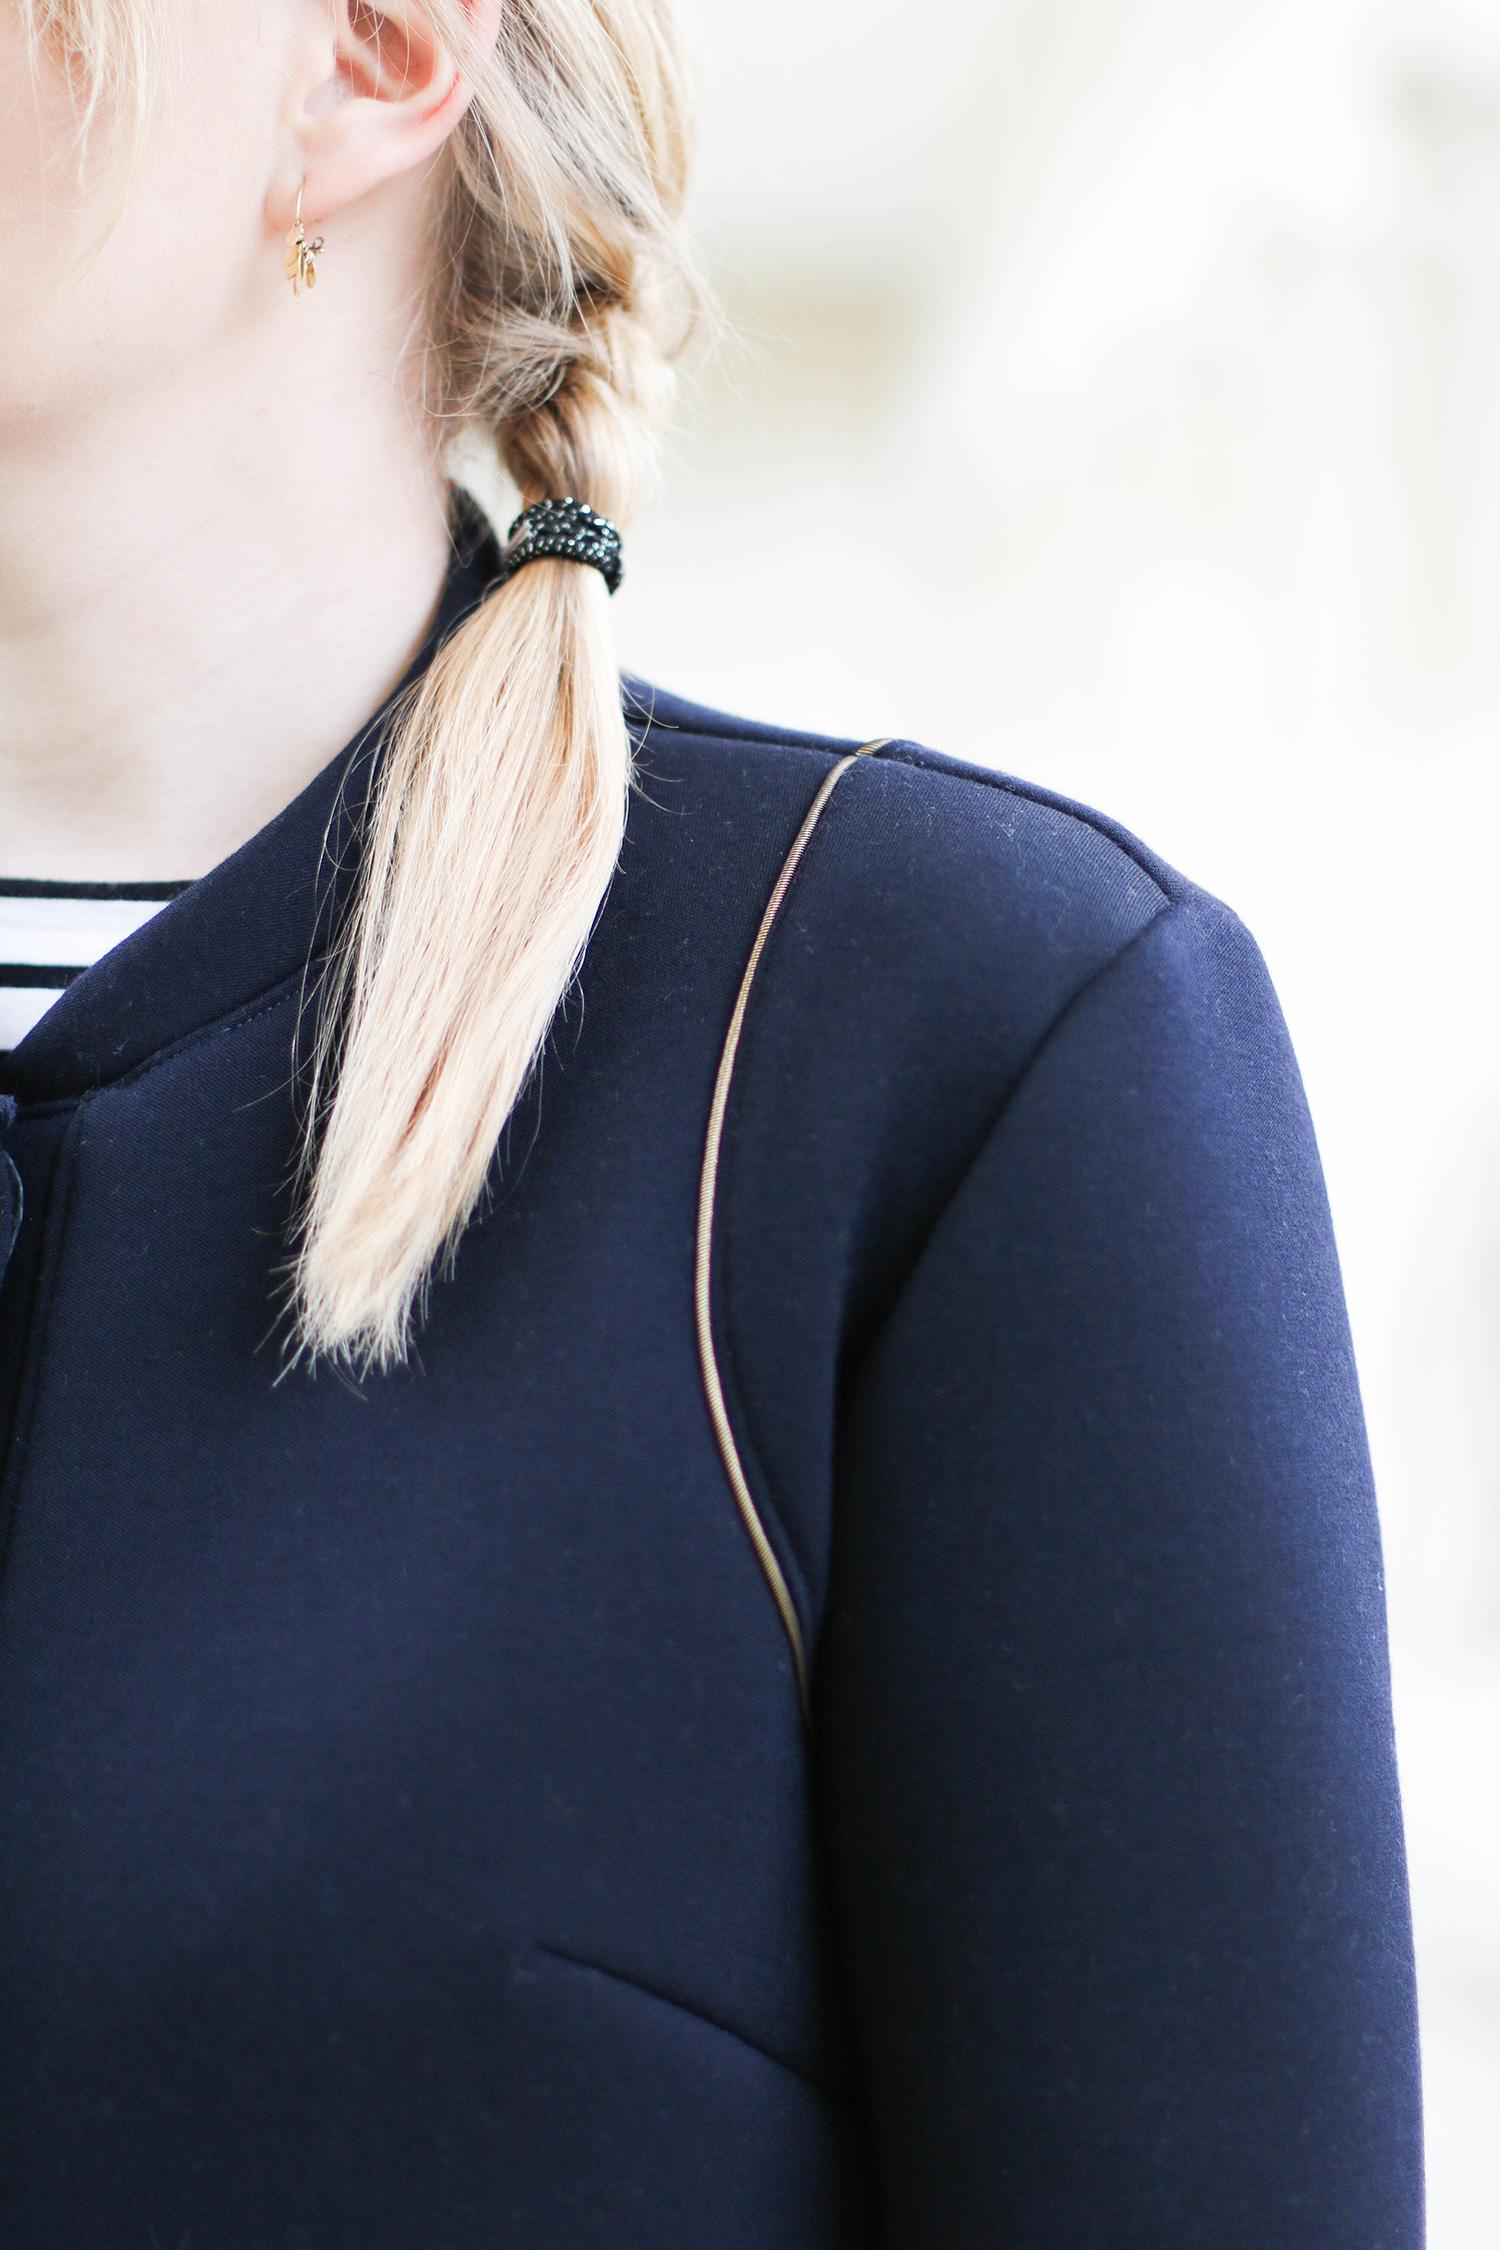 blog-couture-veste-teddy-maxou